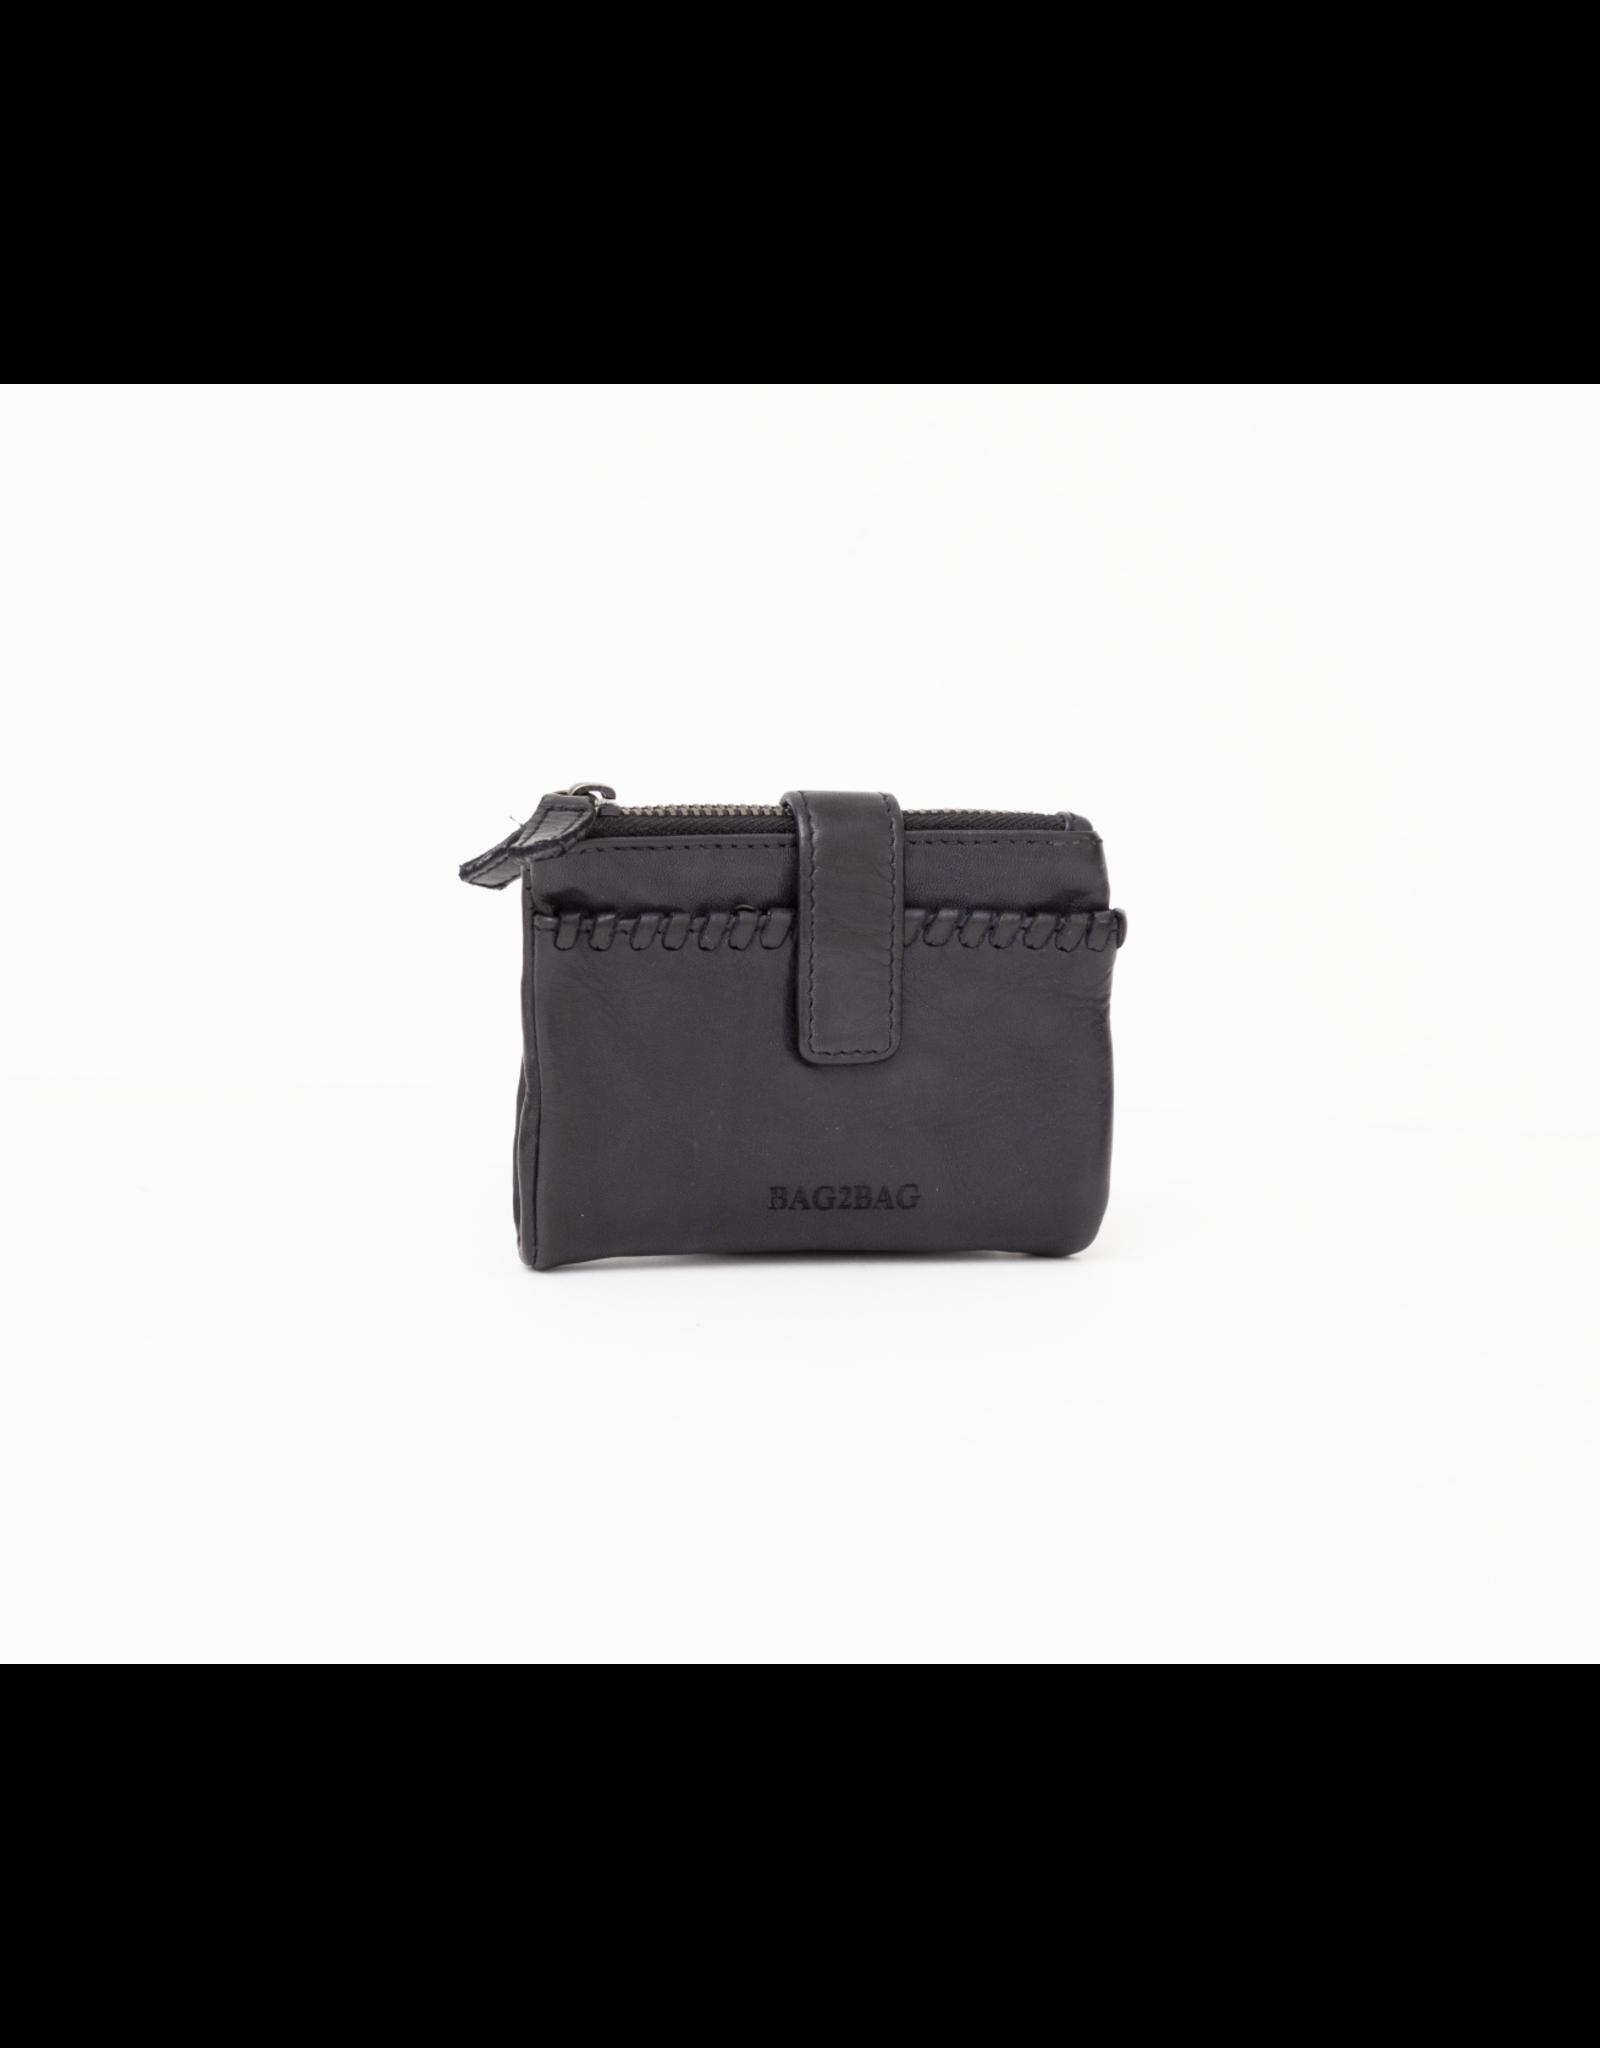 Bag2Bag Bag2bag Lioni Black